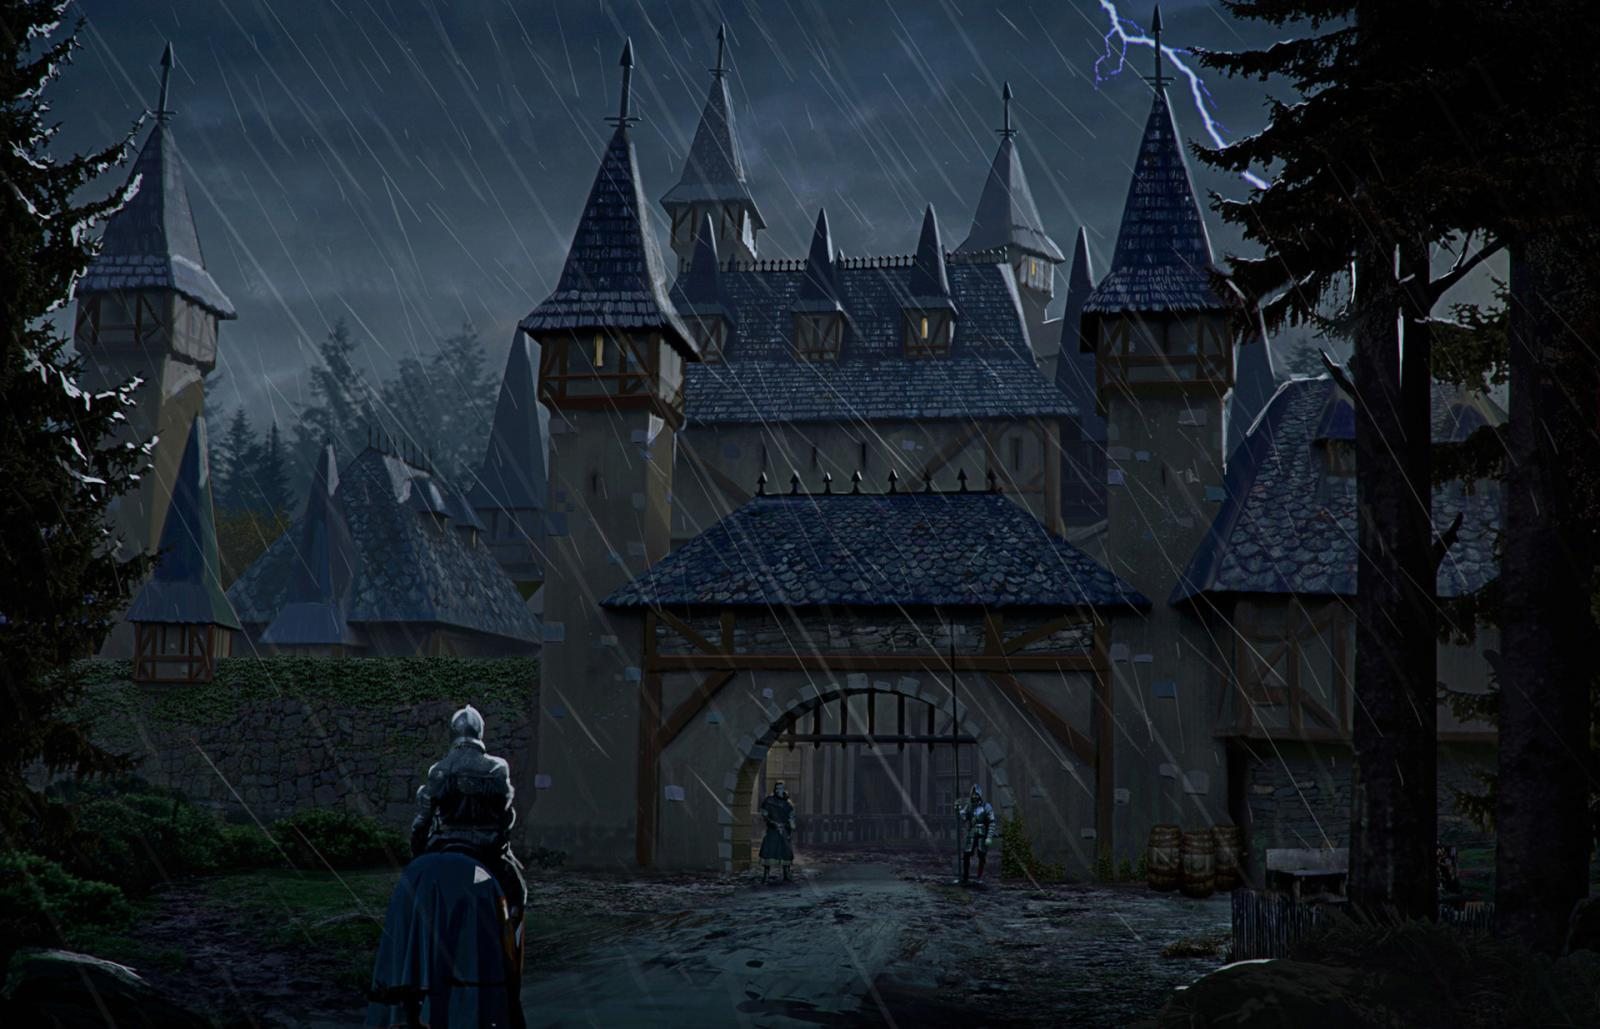 timo-peter-castle-render-04.jpg